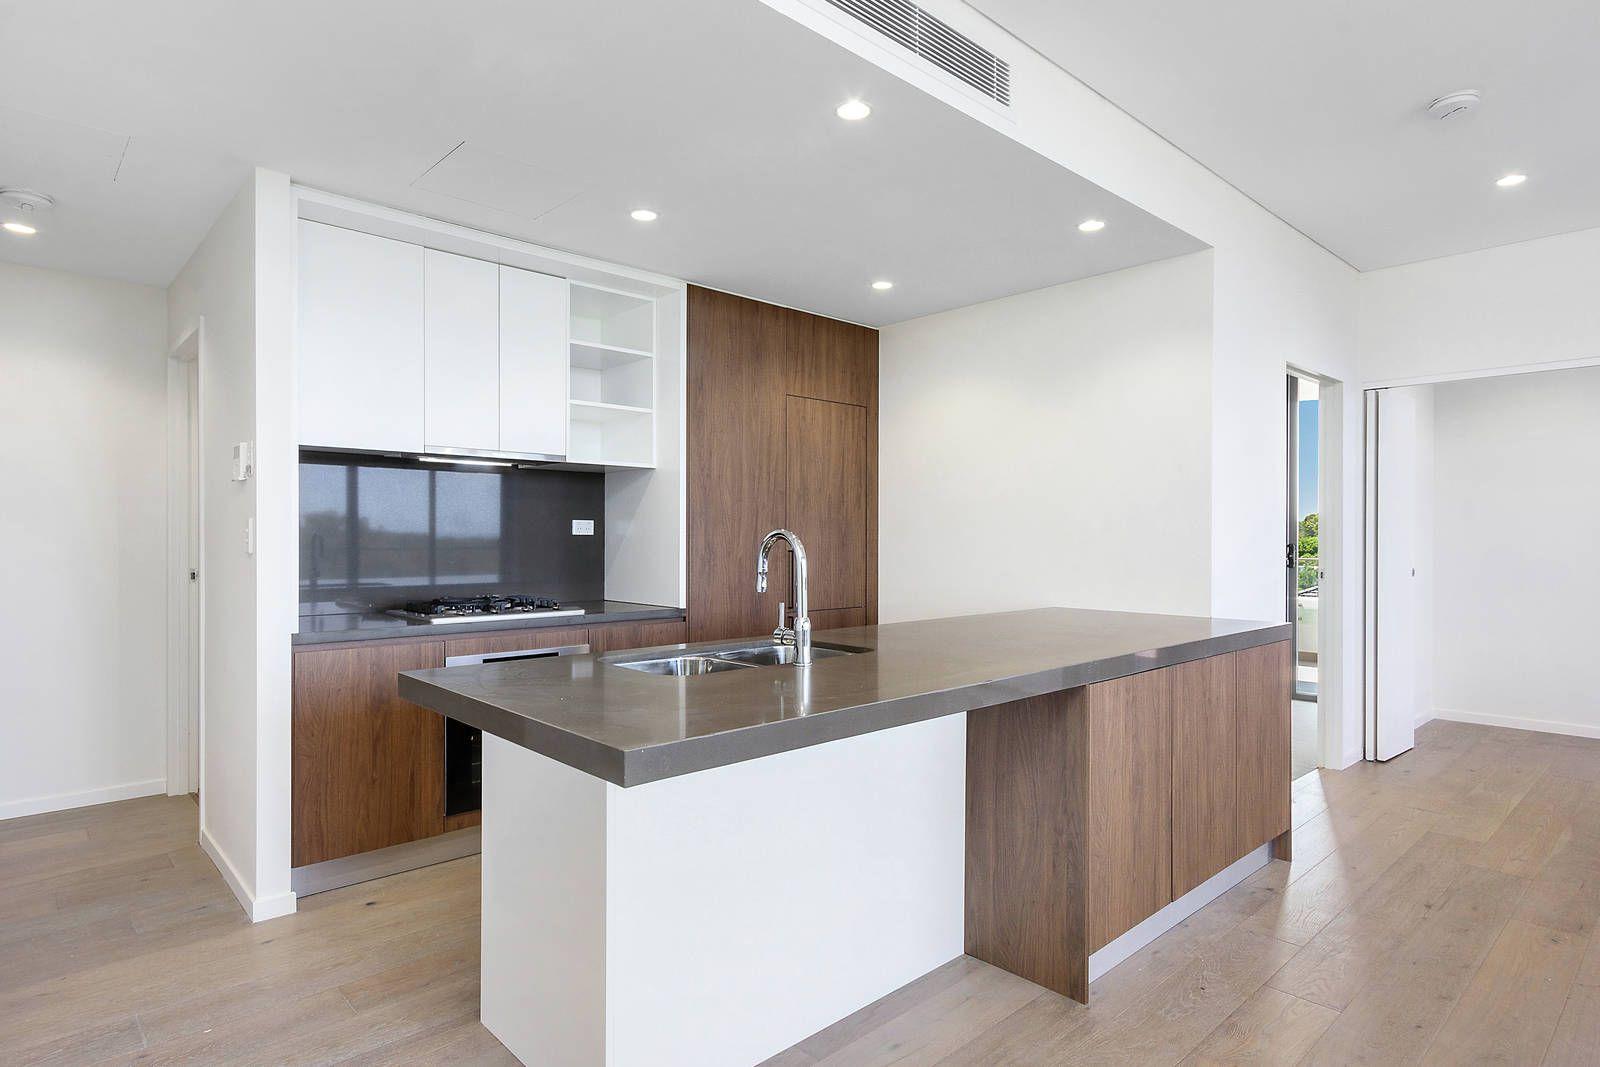 503/27-31 Thornleigh Street, Thornleigh NSW 2120, Image 1